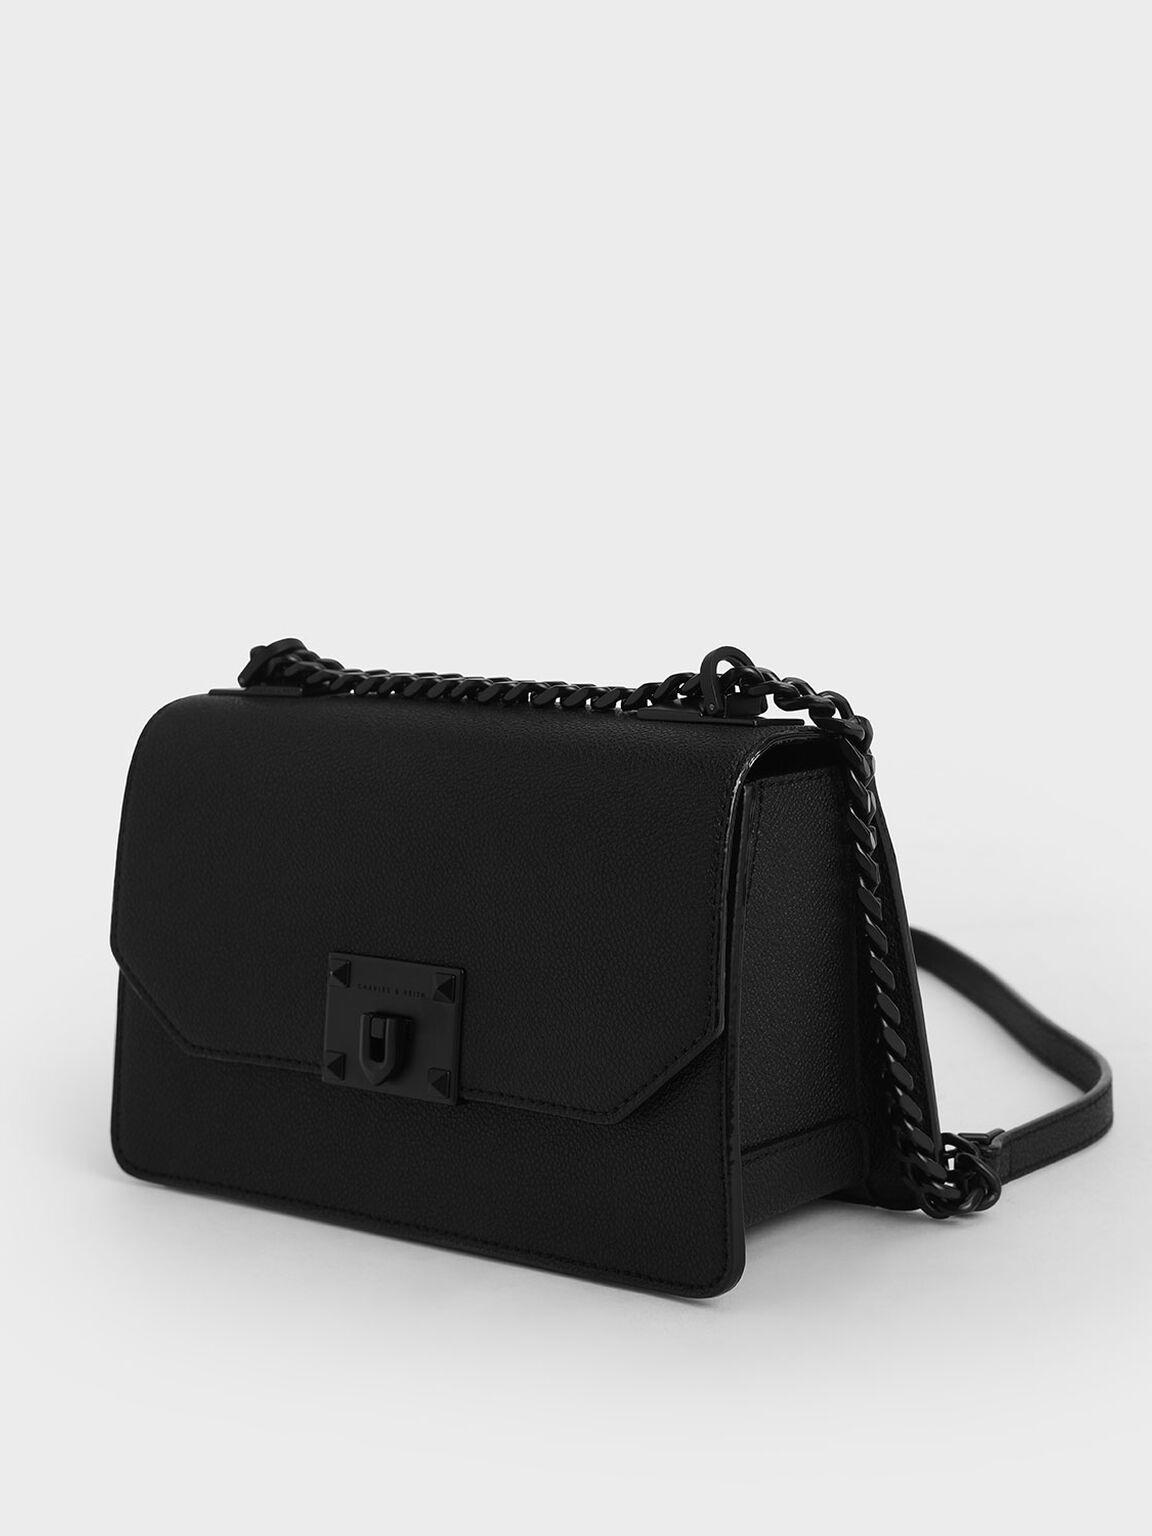 Metallic Push-Lock Crossbody Bag, Ultra-Matte Black, hi-res